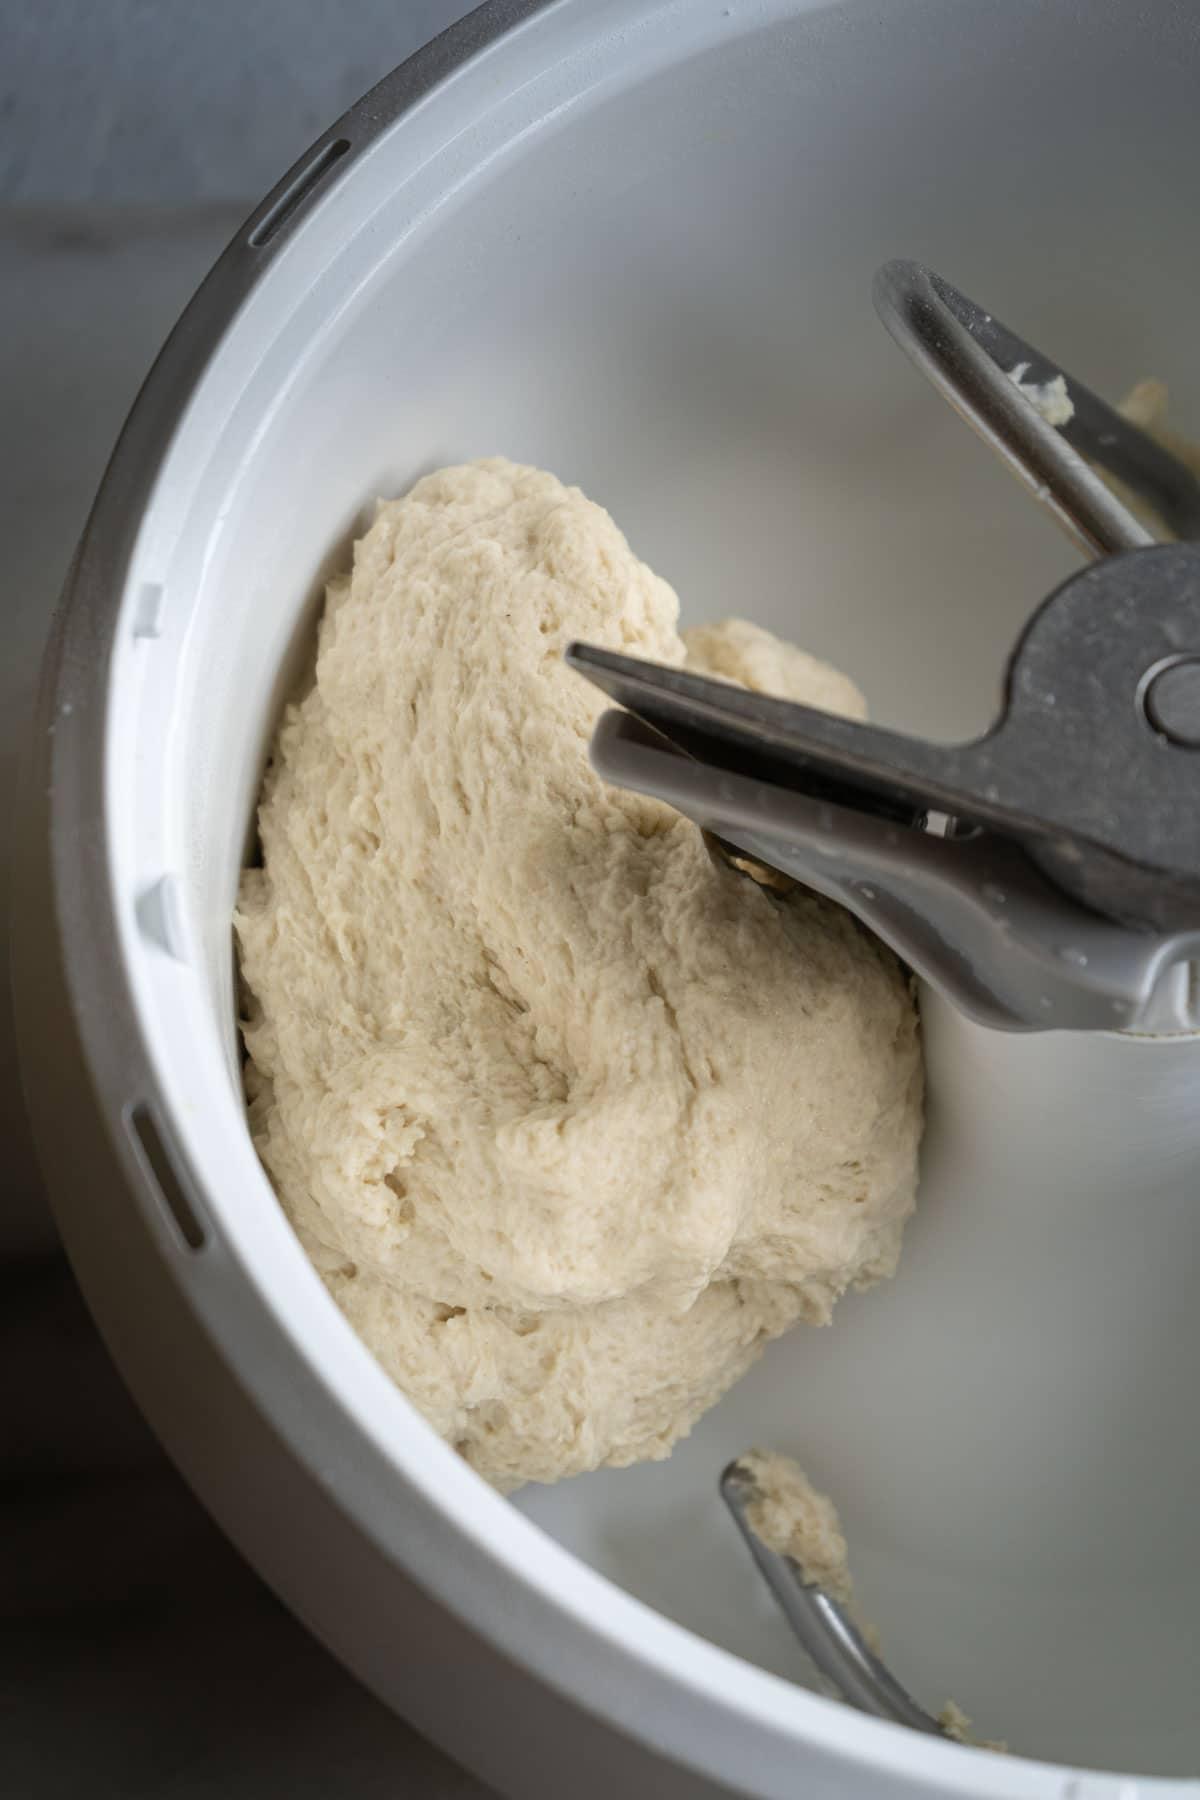 rough milk bread dough.